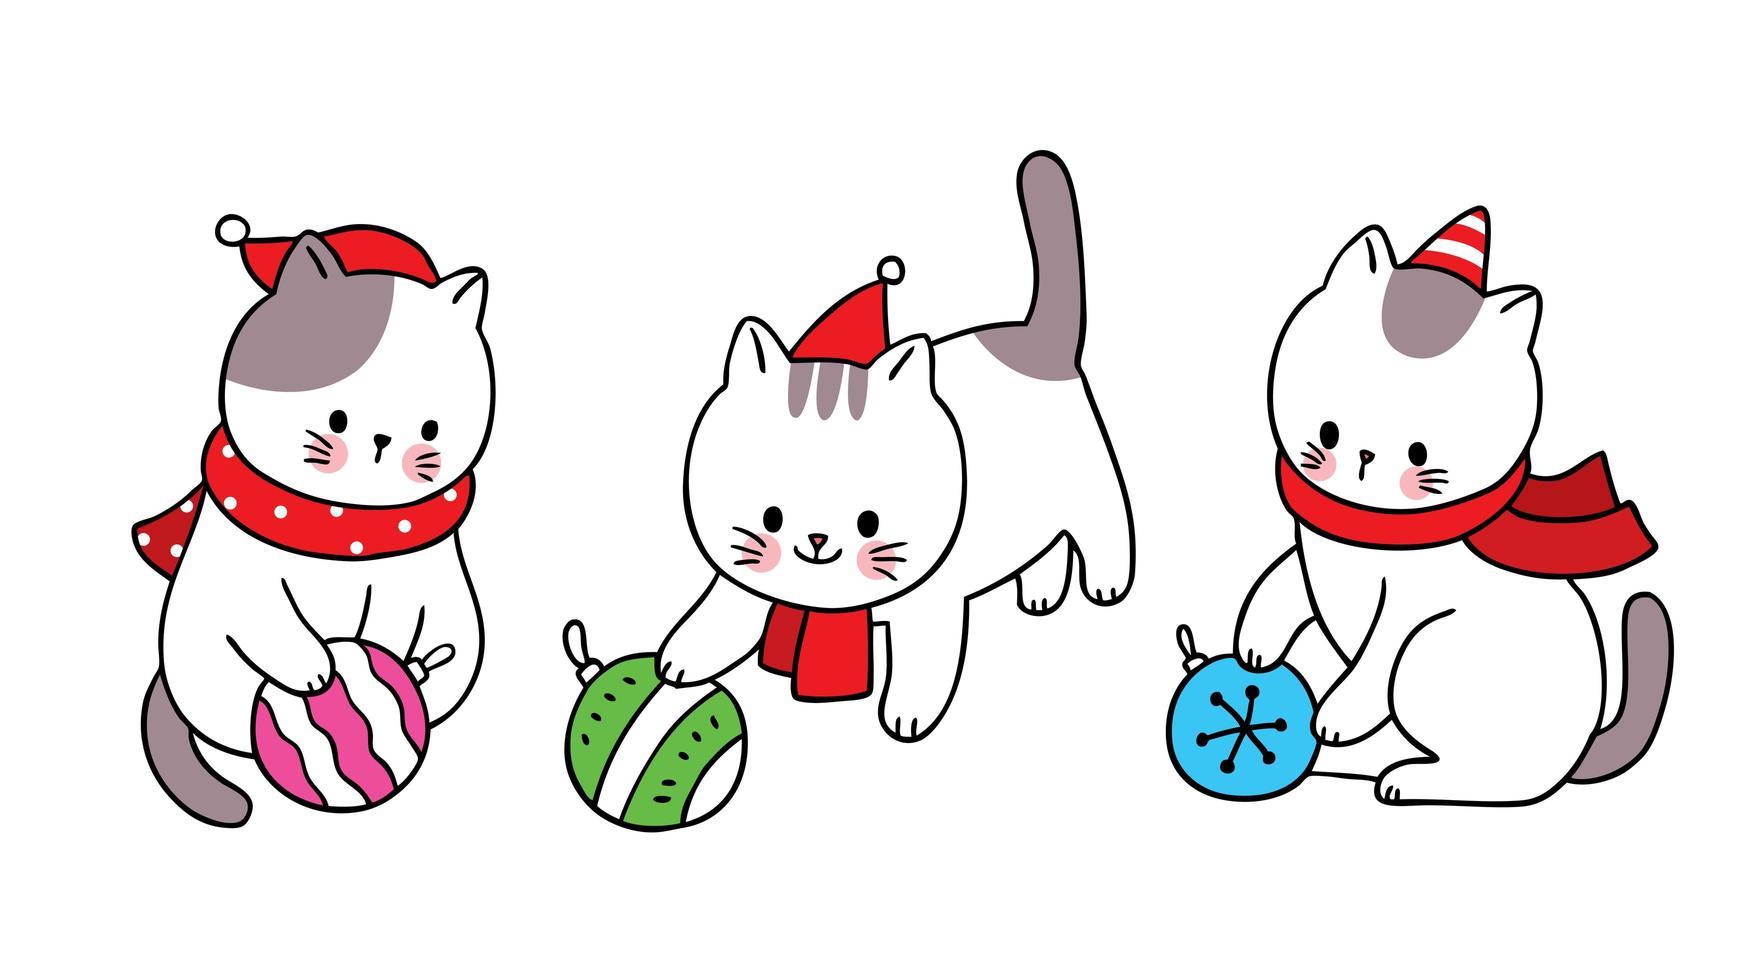 handritade julkatter som leker med ornament vektor